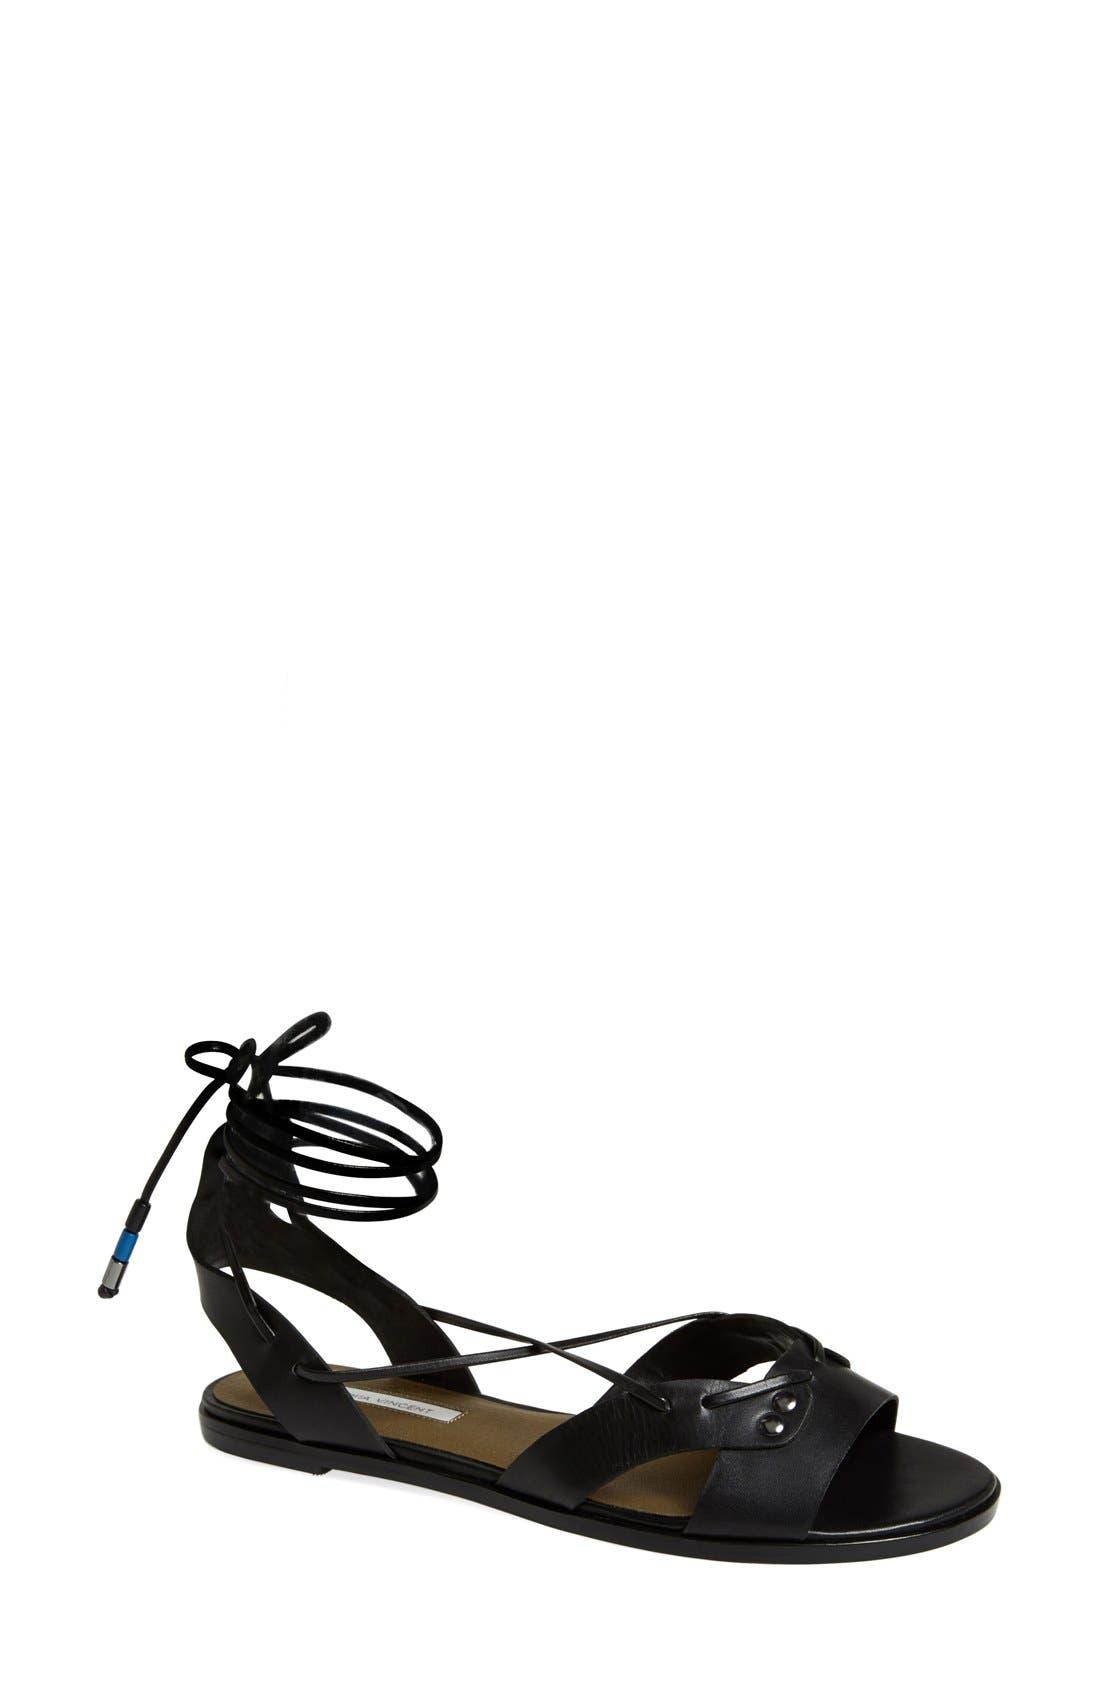 Alternate Image 1 Selected - Cynthia Vincent 'Fantine' Leather Gladiator Sandal (Women)